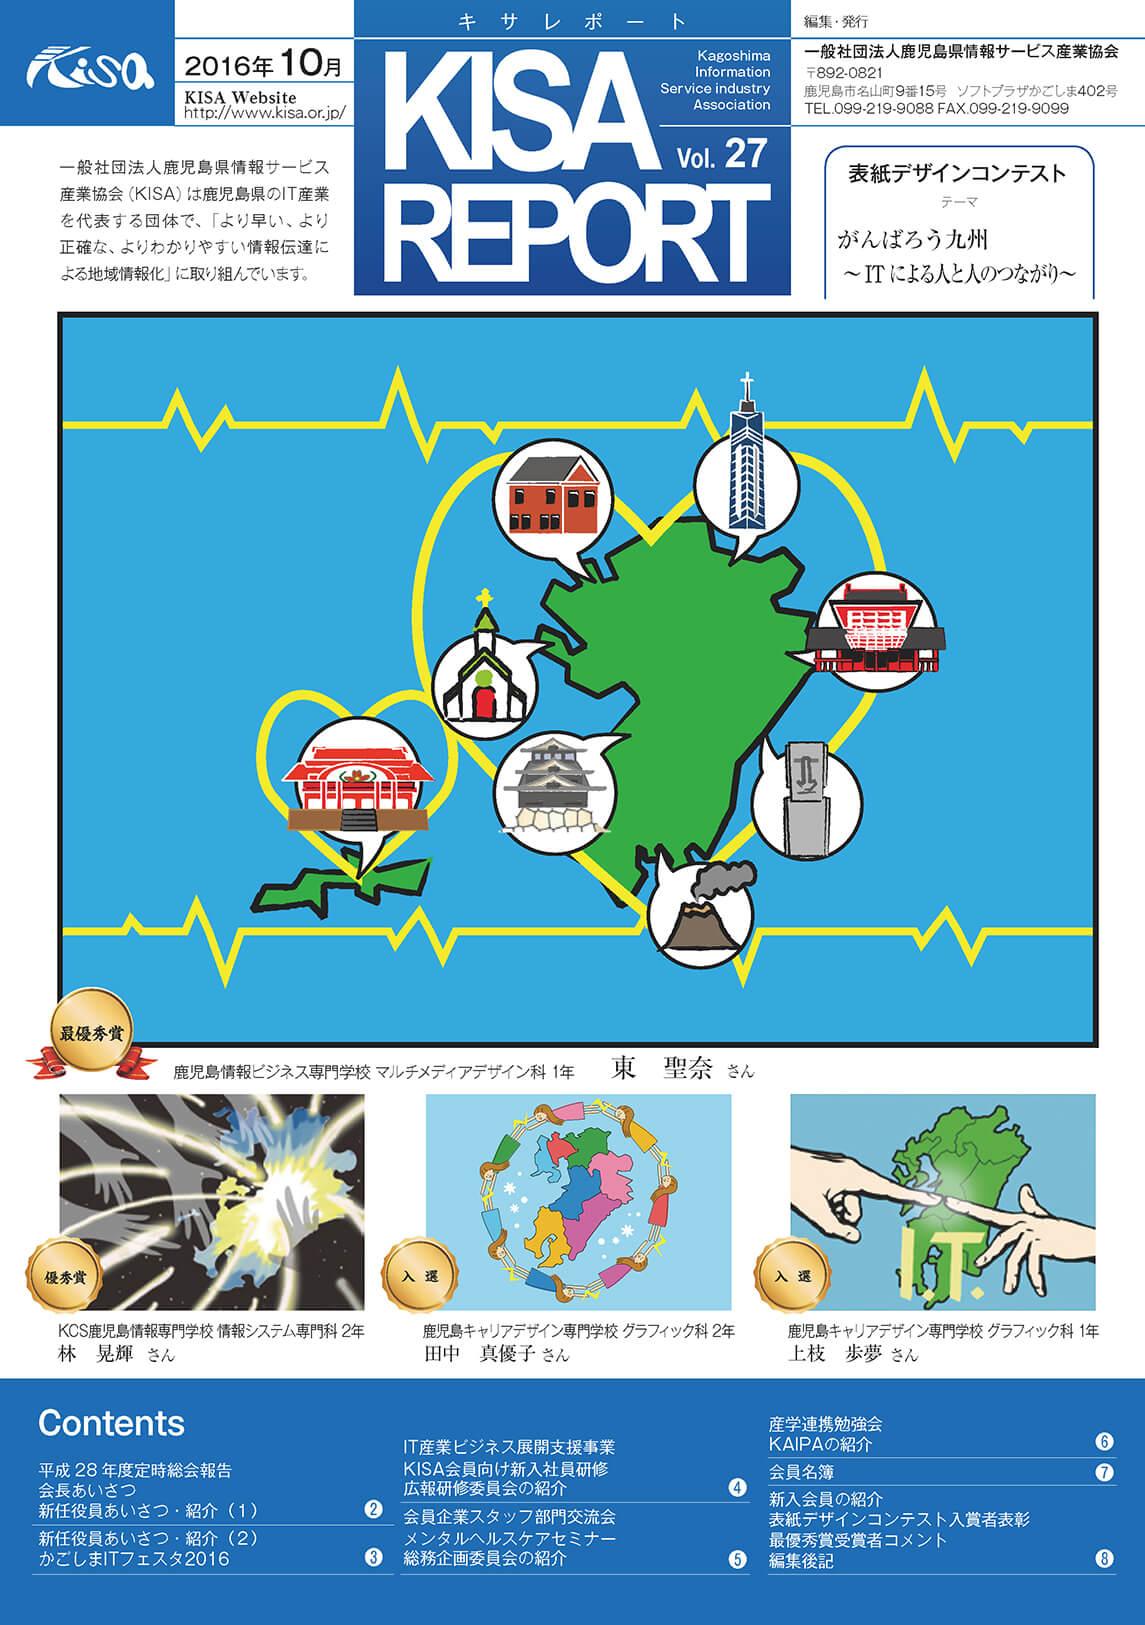 『KISA REPORT Vol.27』発刊しました